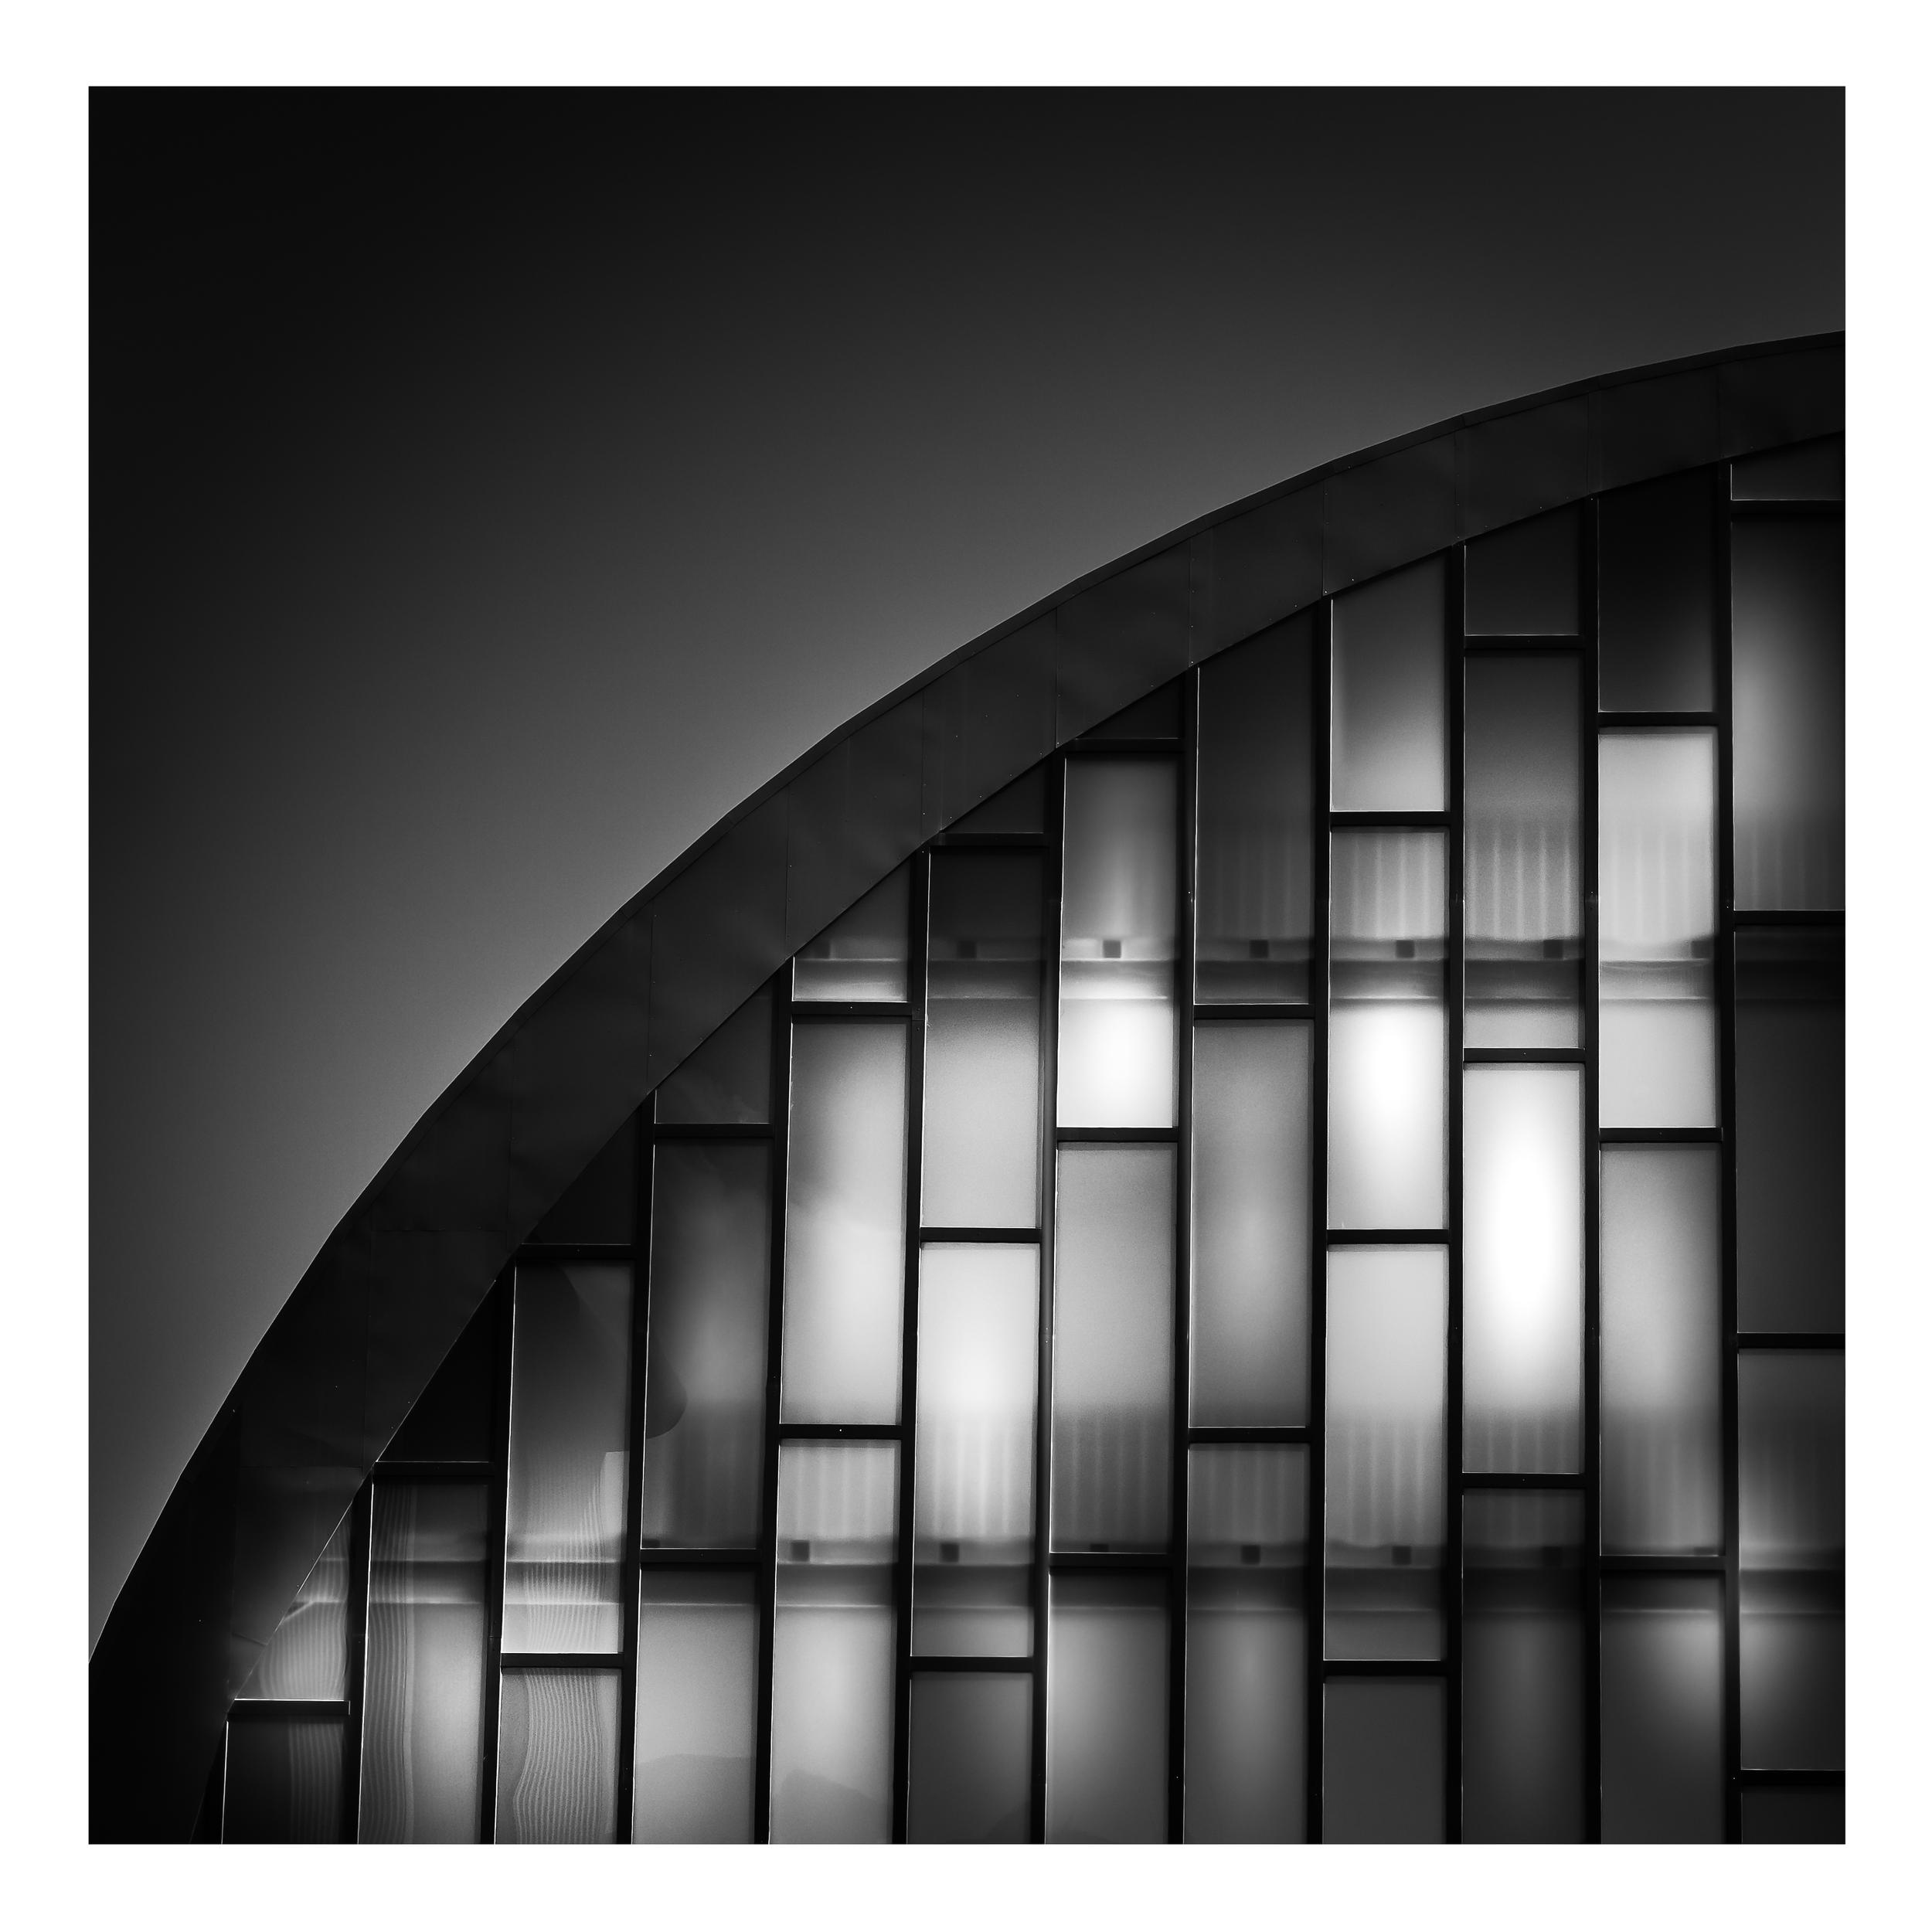 diffuser (net-zero energy building, Malaga)